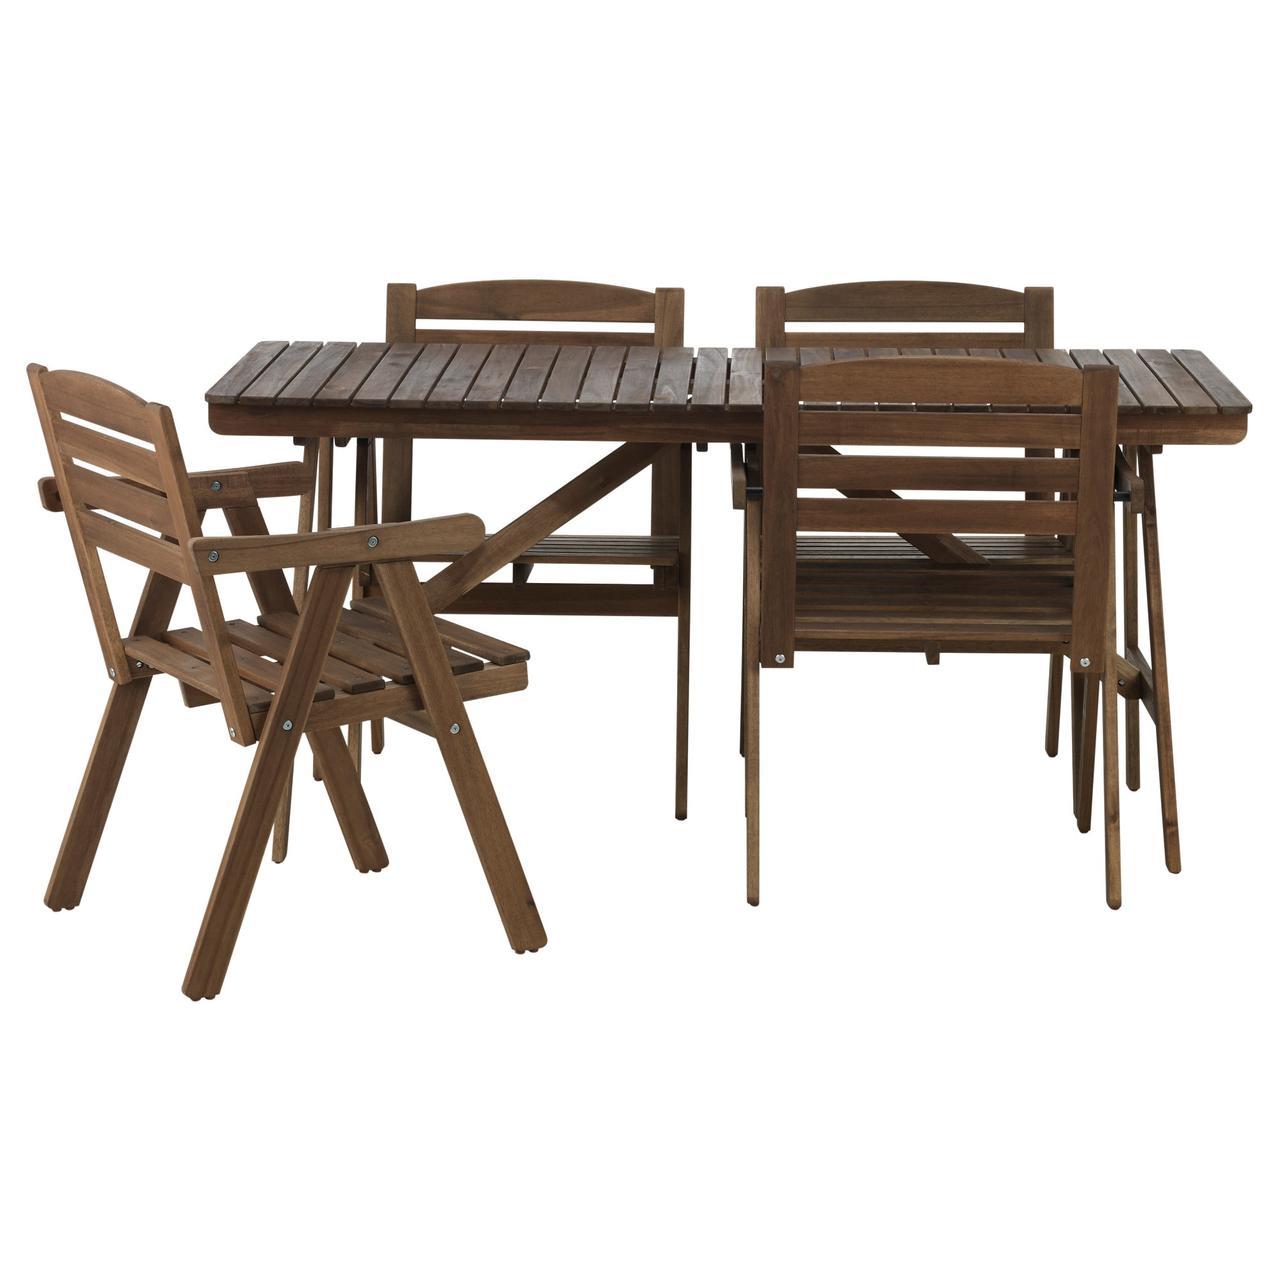 ФАЛЬХОЛЬМЕН, Стол+4 кресла, д/сада